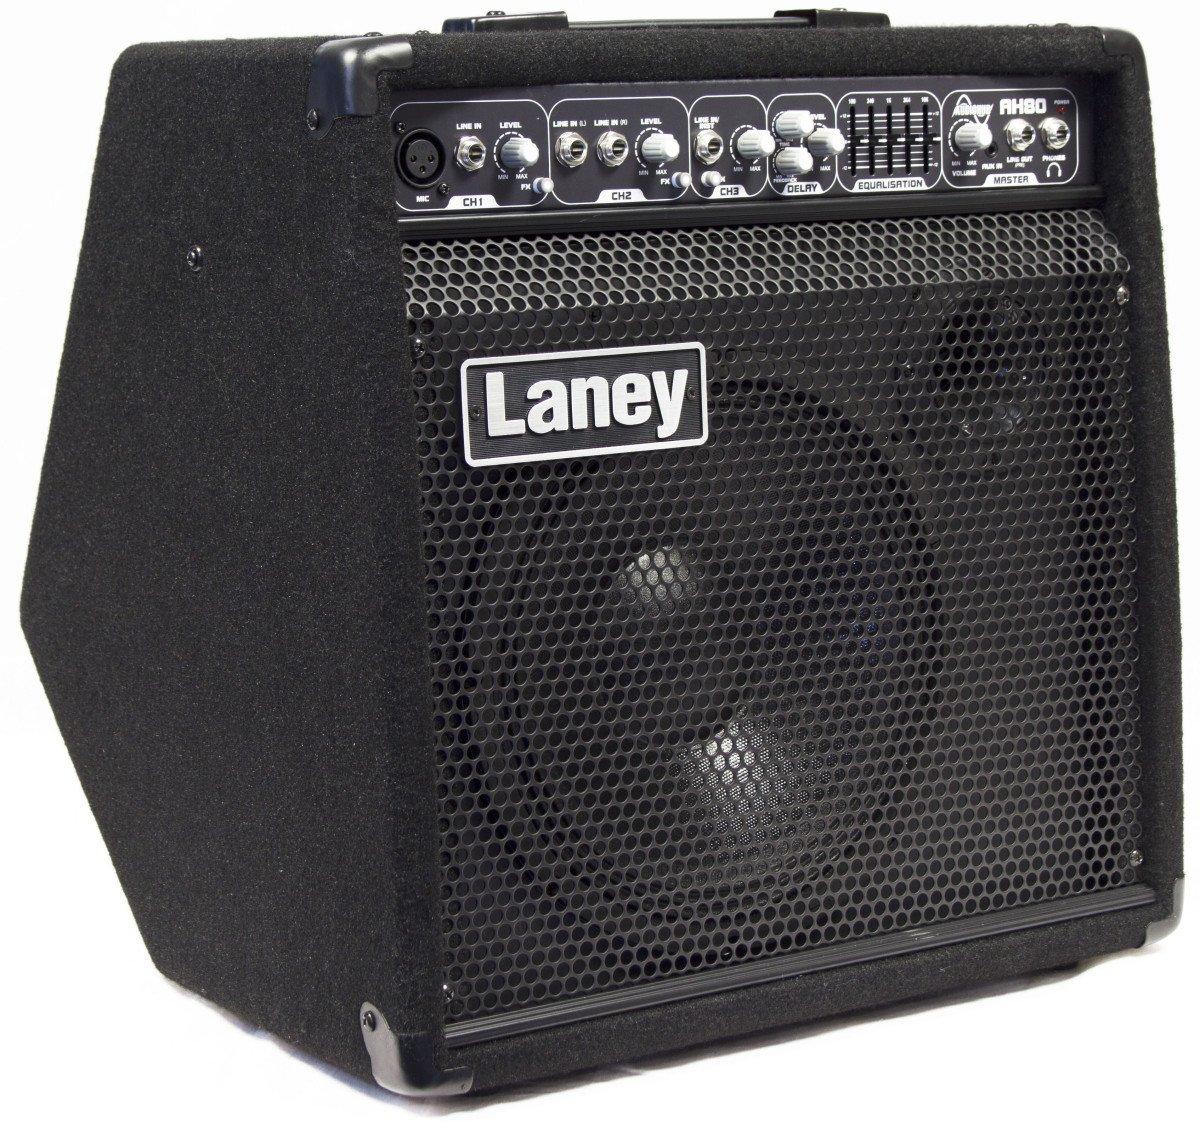 Laney AH80 Multi instrument combo amp, 3ch 80W, 10